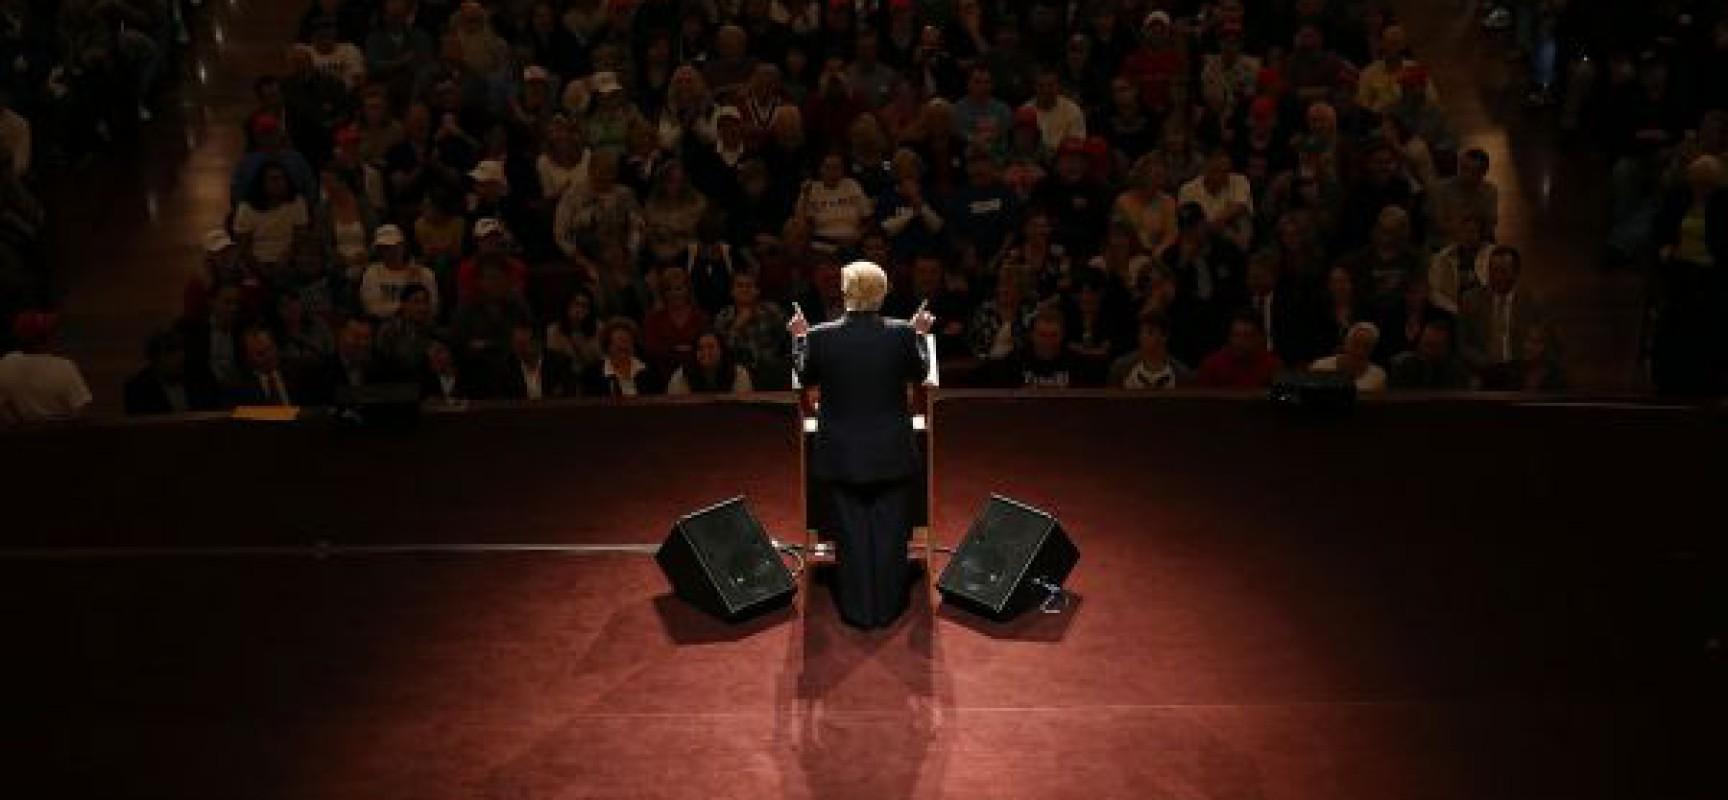 La disparition du président Trump  (Paul Craig Roberts)